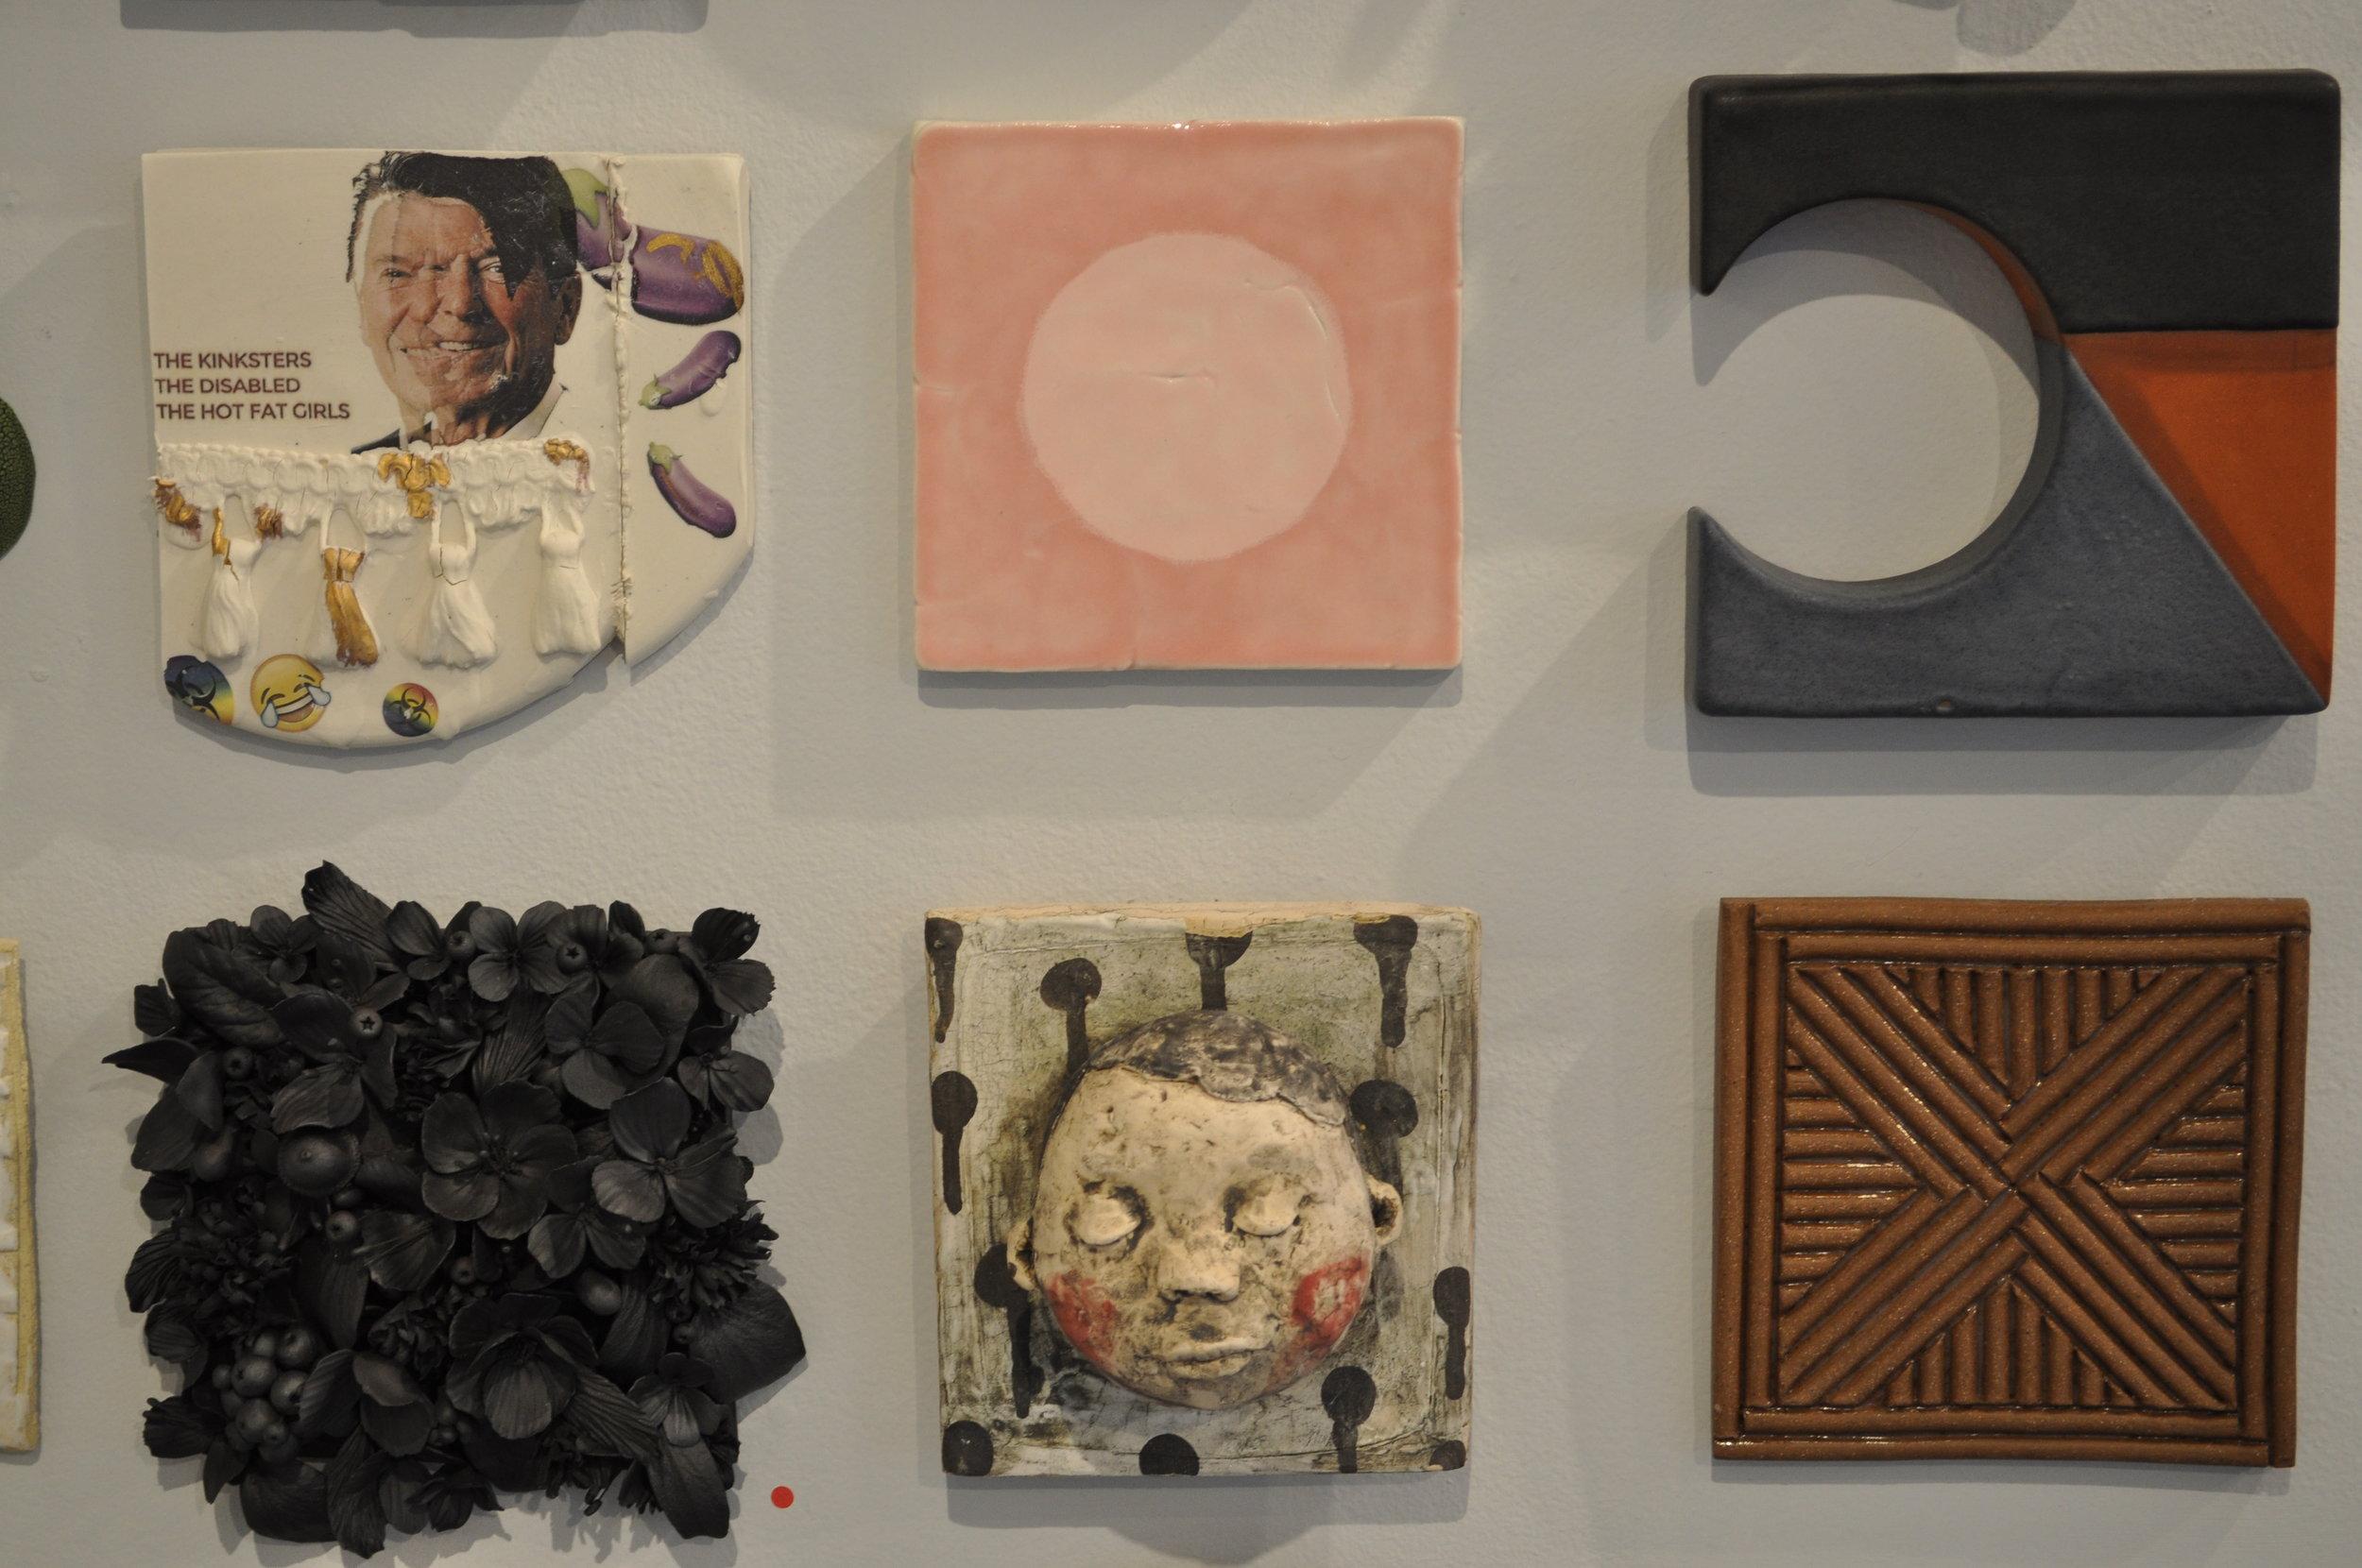 1.  Dustin Yager,  Compostion 4  $120  2.  Ron Geibel,  Pink on Pink  1 $150  3.  Logan Wall,  Wall Tile #1  $85  4. Rain Harris,  Jardin Noir 1  (SOLD) 5.  Kensuke Yamada,  Wall Tile 3  $150  6.  David MacDonald,  Carved Stoneware Tile 3  $50